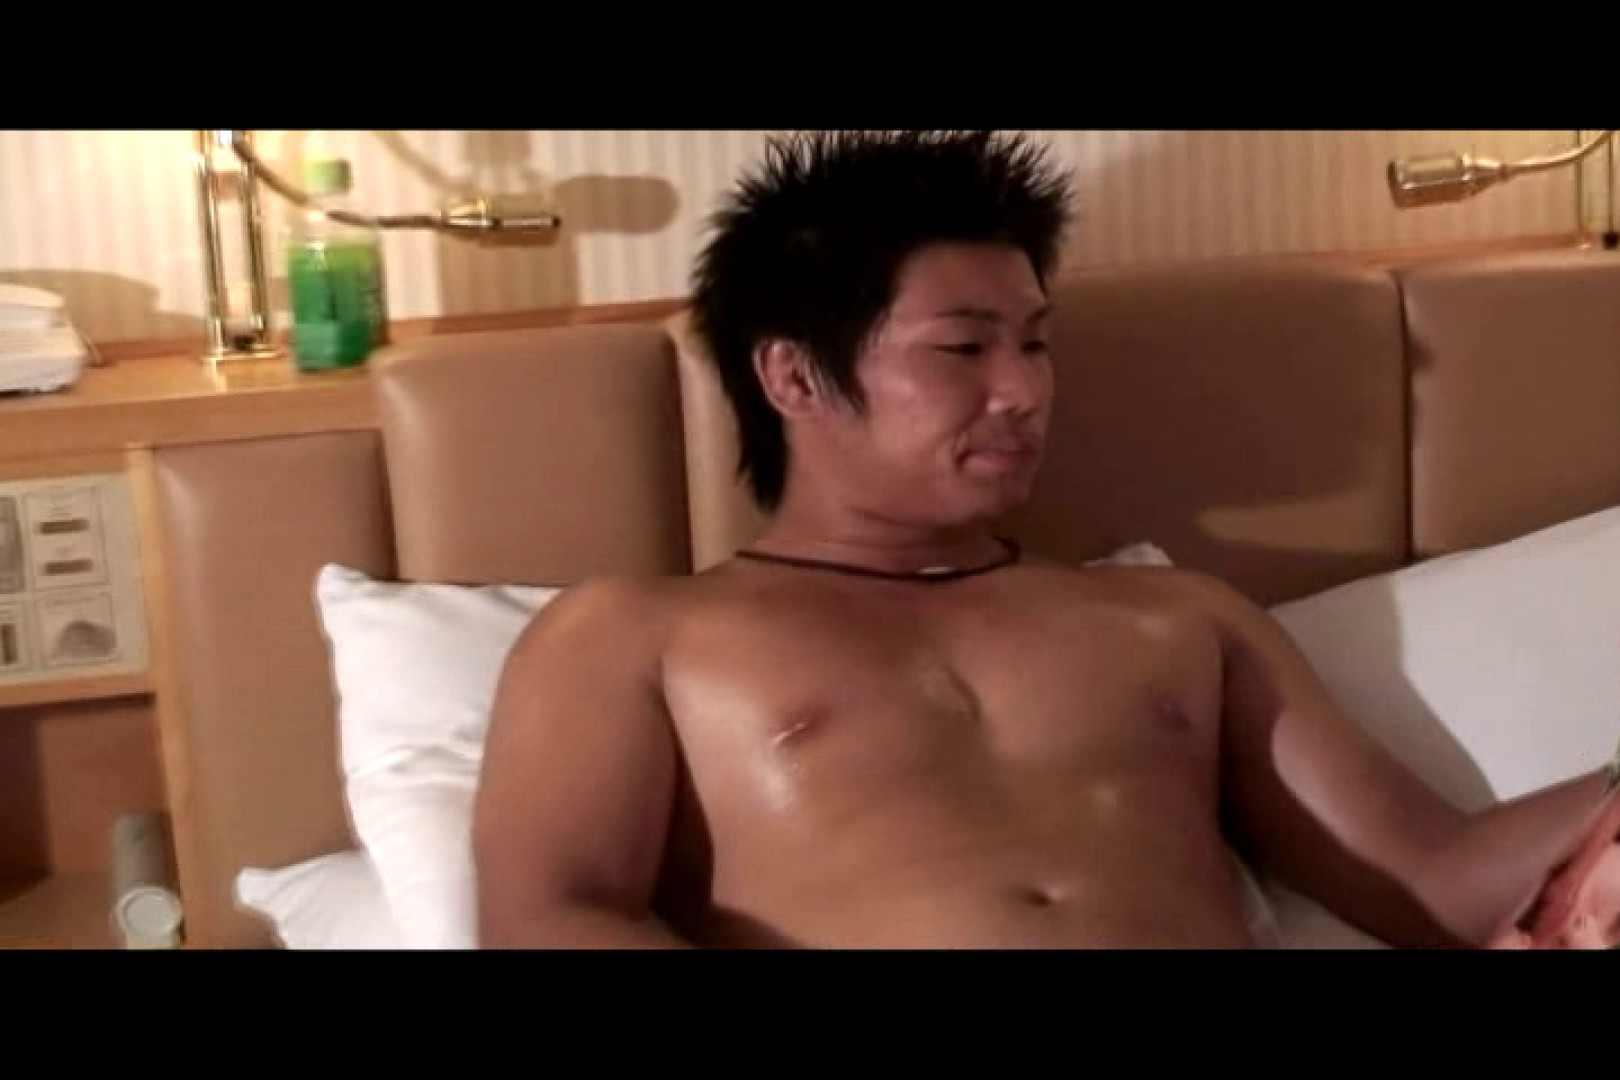 Bistro「イケメン」~Mokkori和風仕立て~vol.03 ゲイのオナニー映像 男同士動画 90枚 86